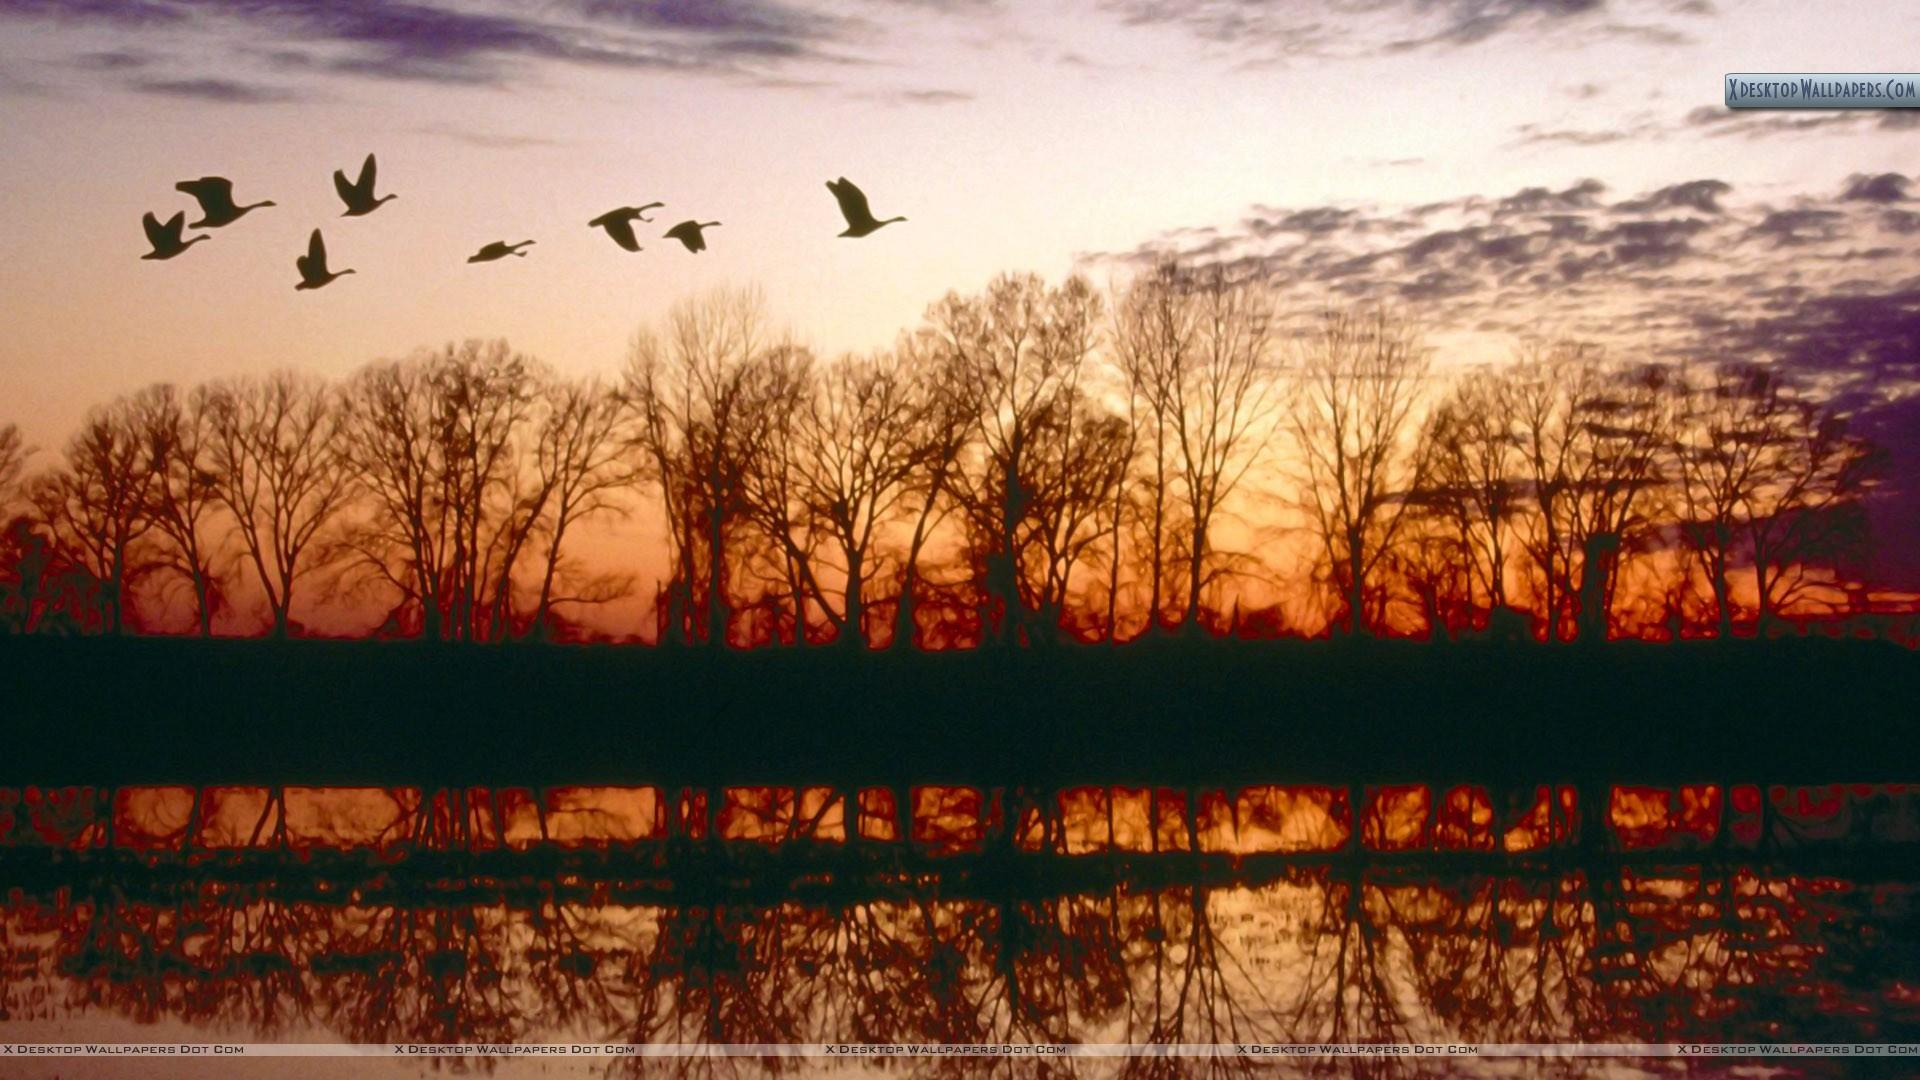 Canada Geese Migrating Missouri Wallpaper 1920x1080